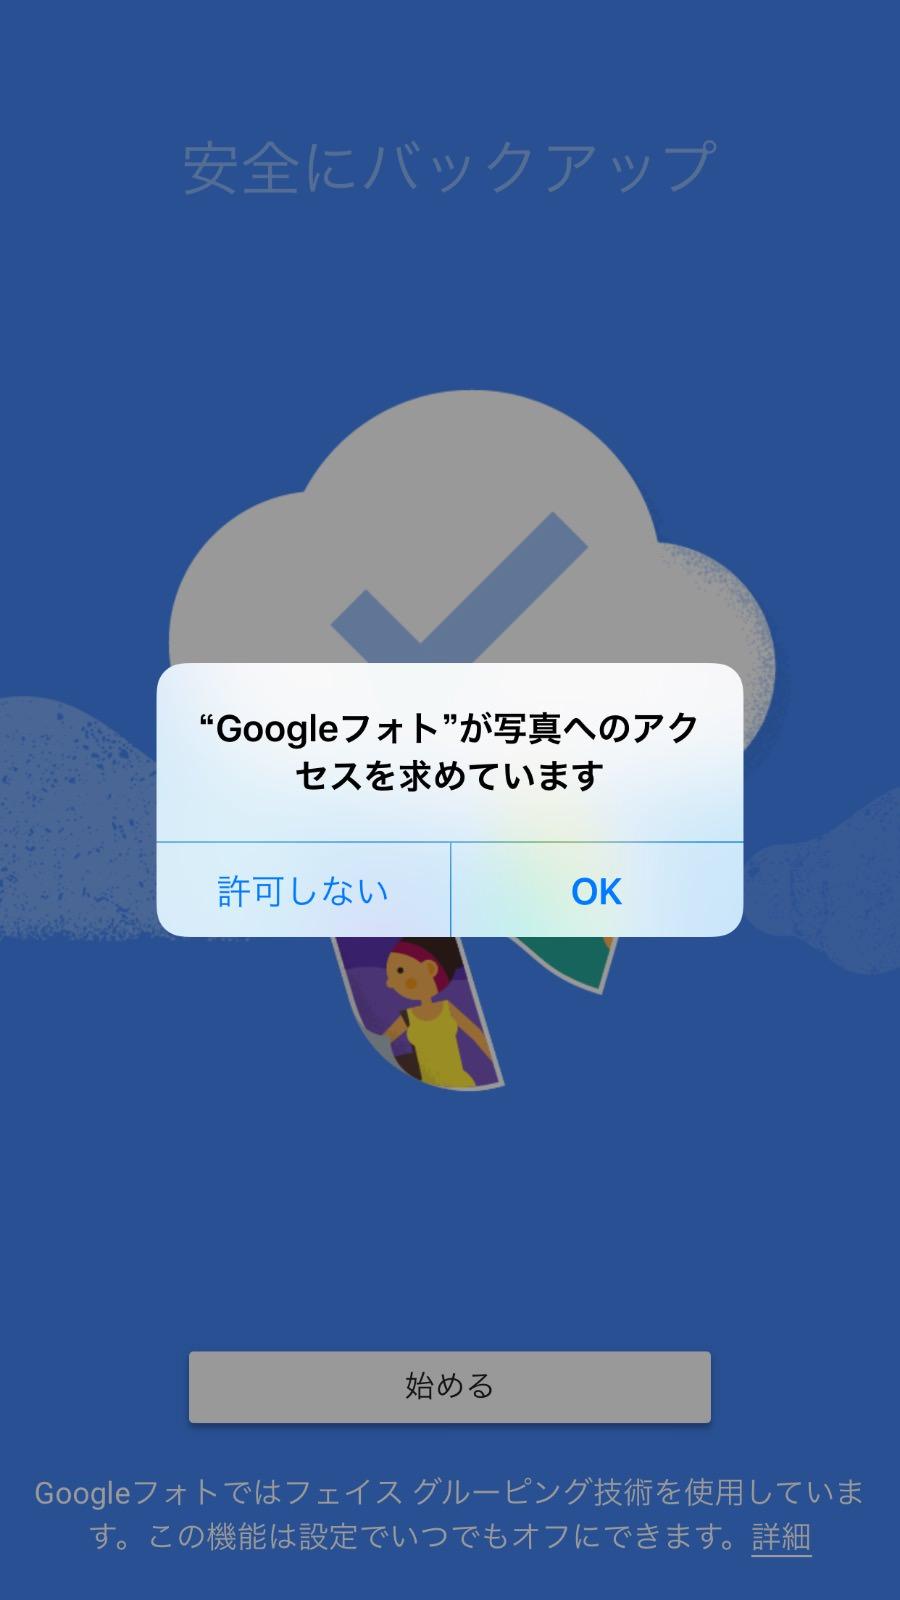 Google photo error 2265